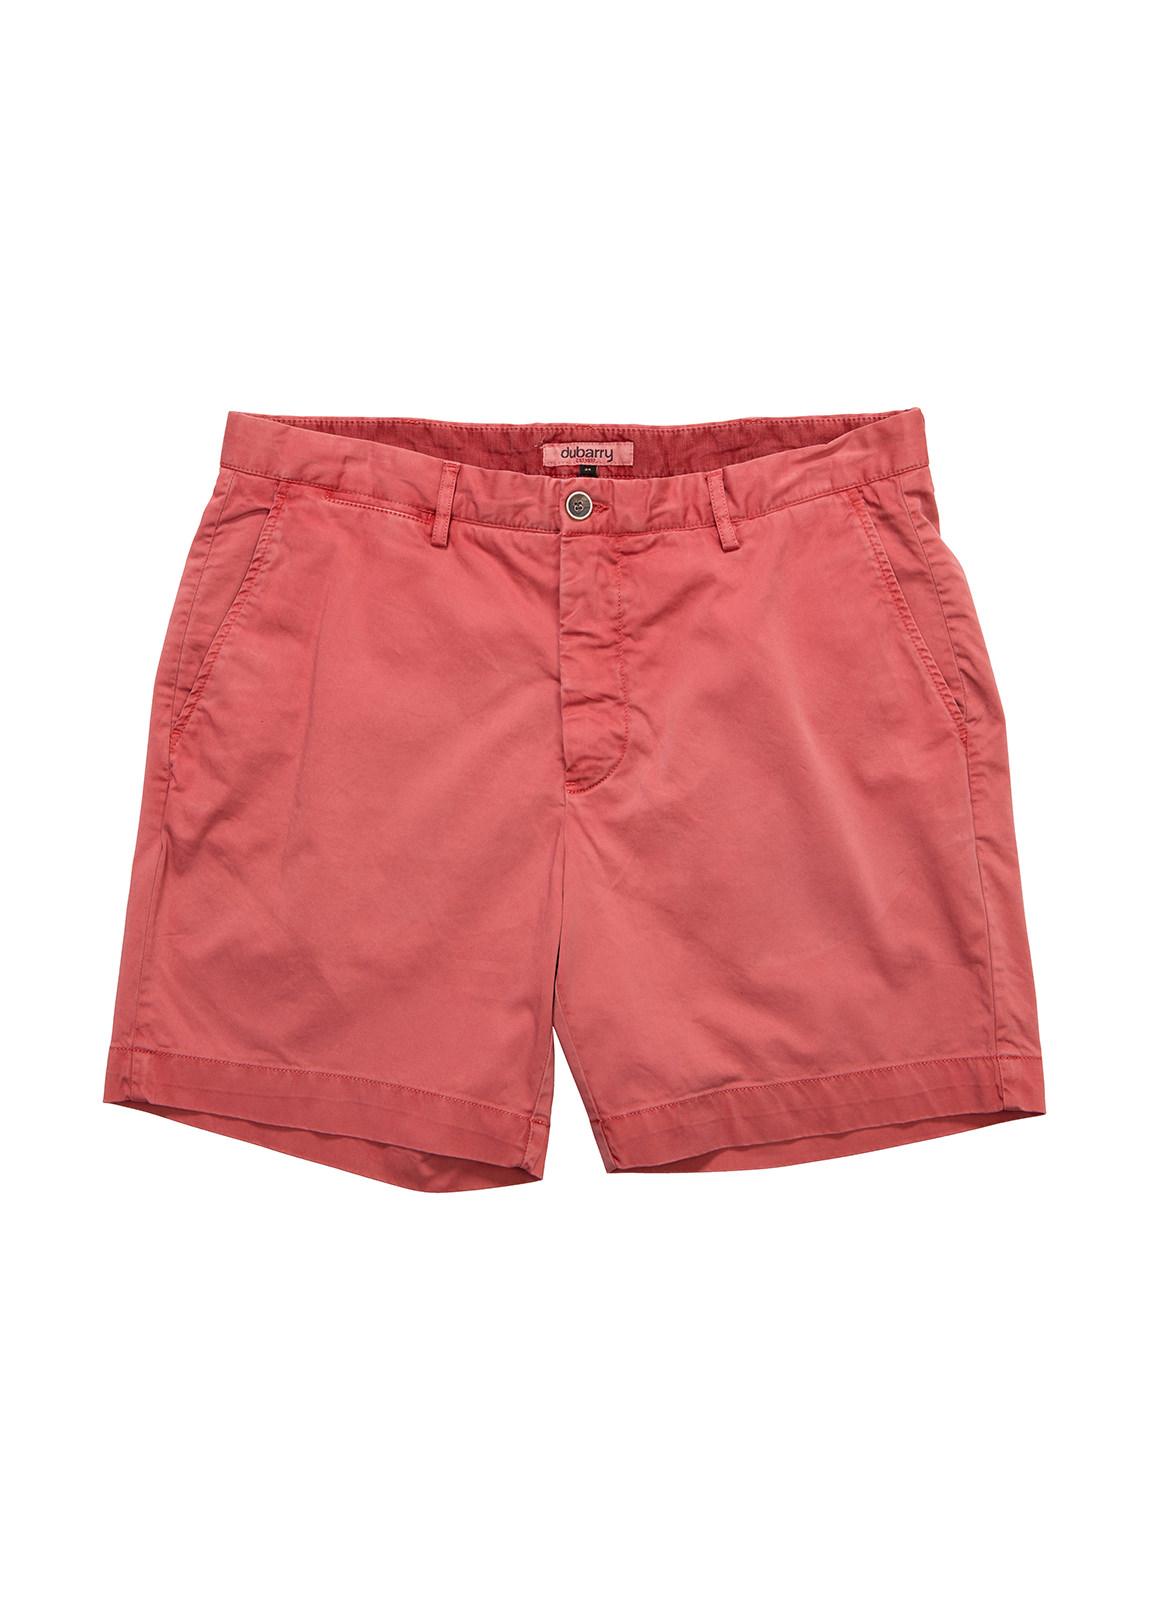 Glandore Men's Shorts - Red